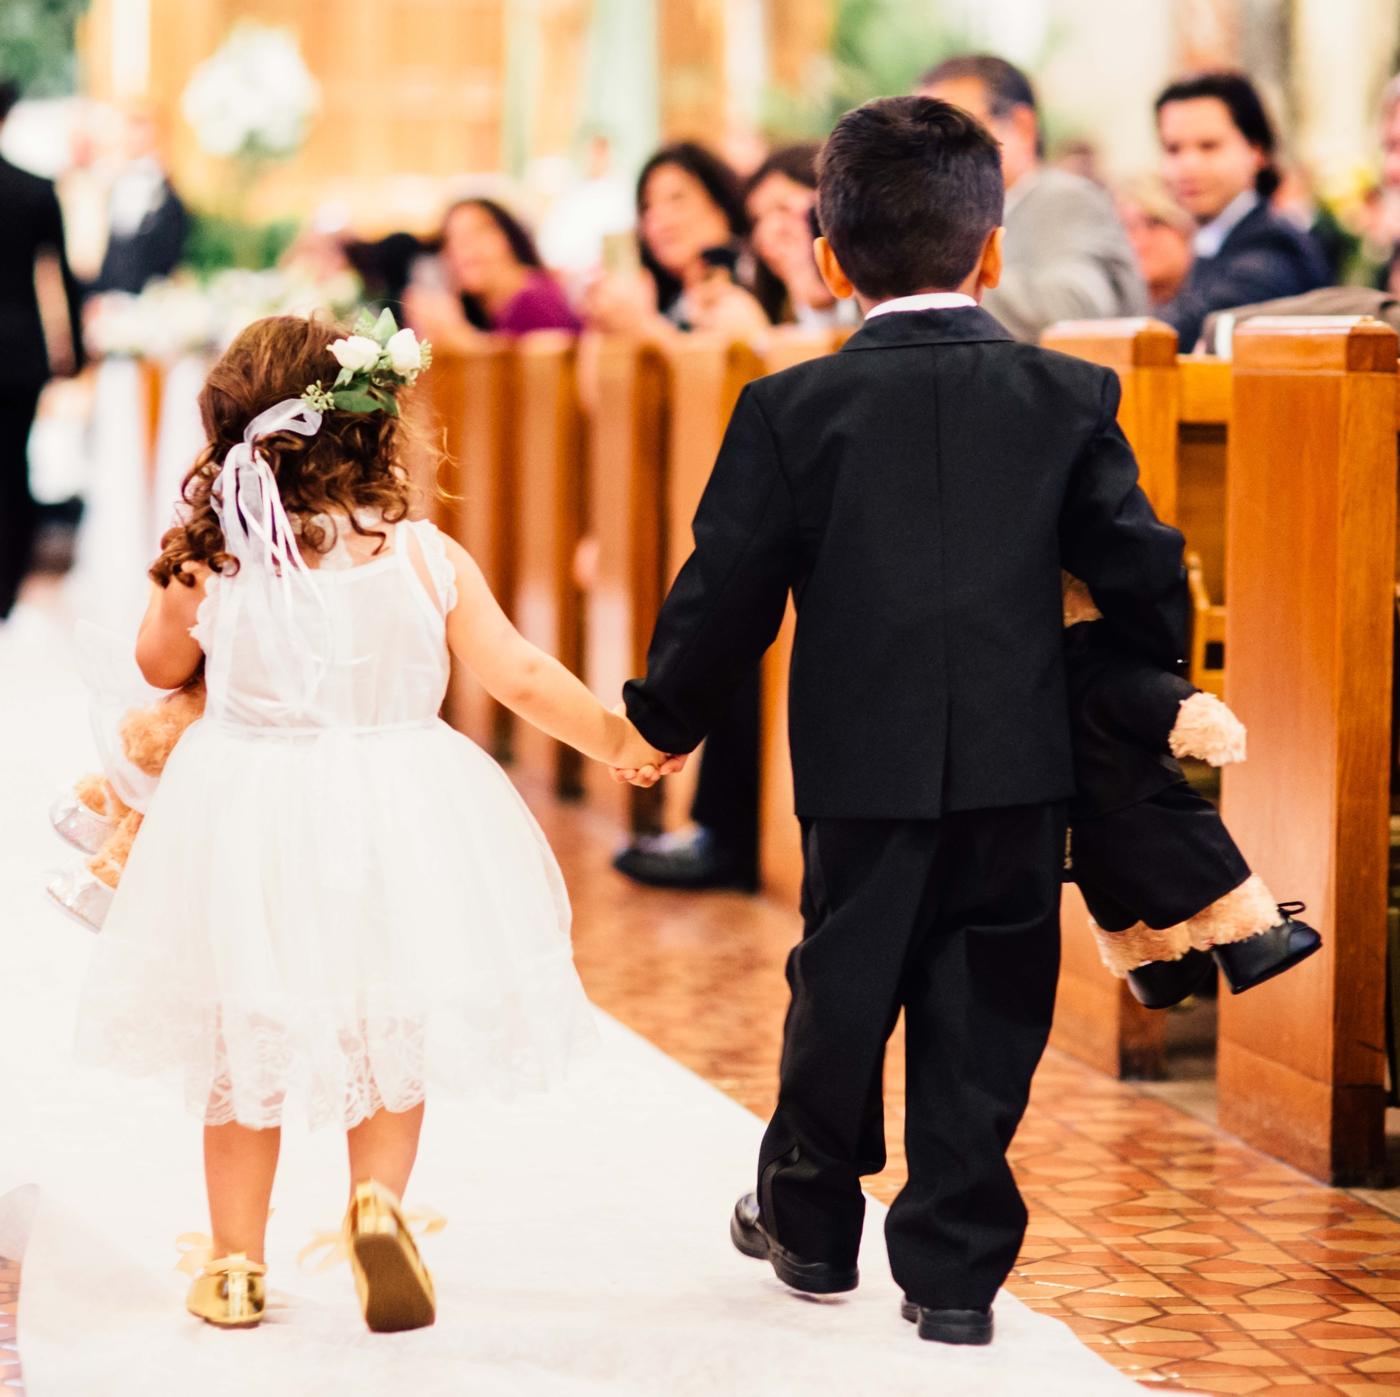 chicago-fine-art-wedding-photography-alfano4